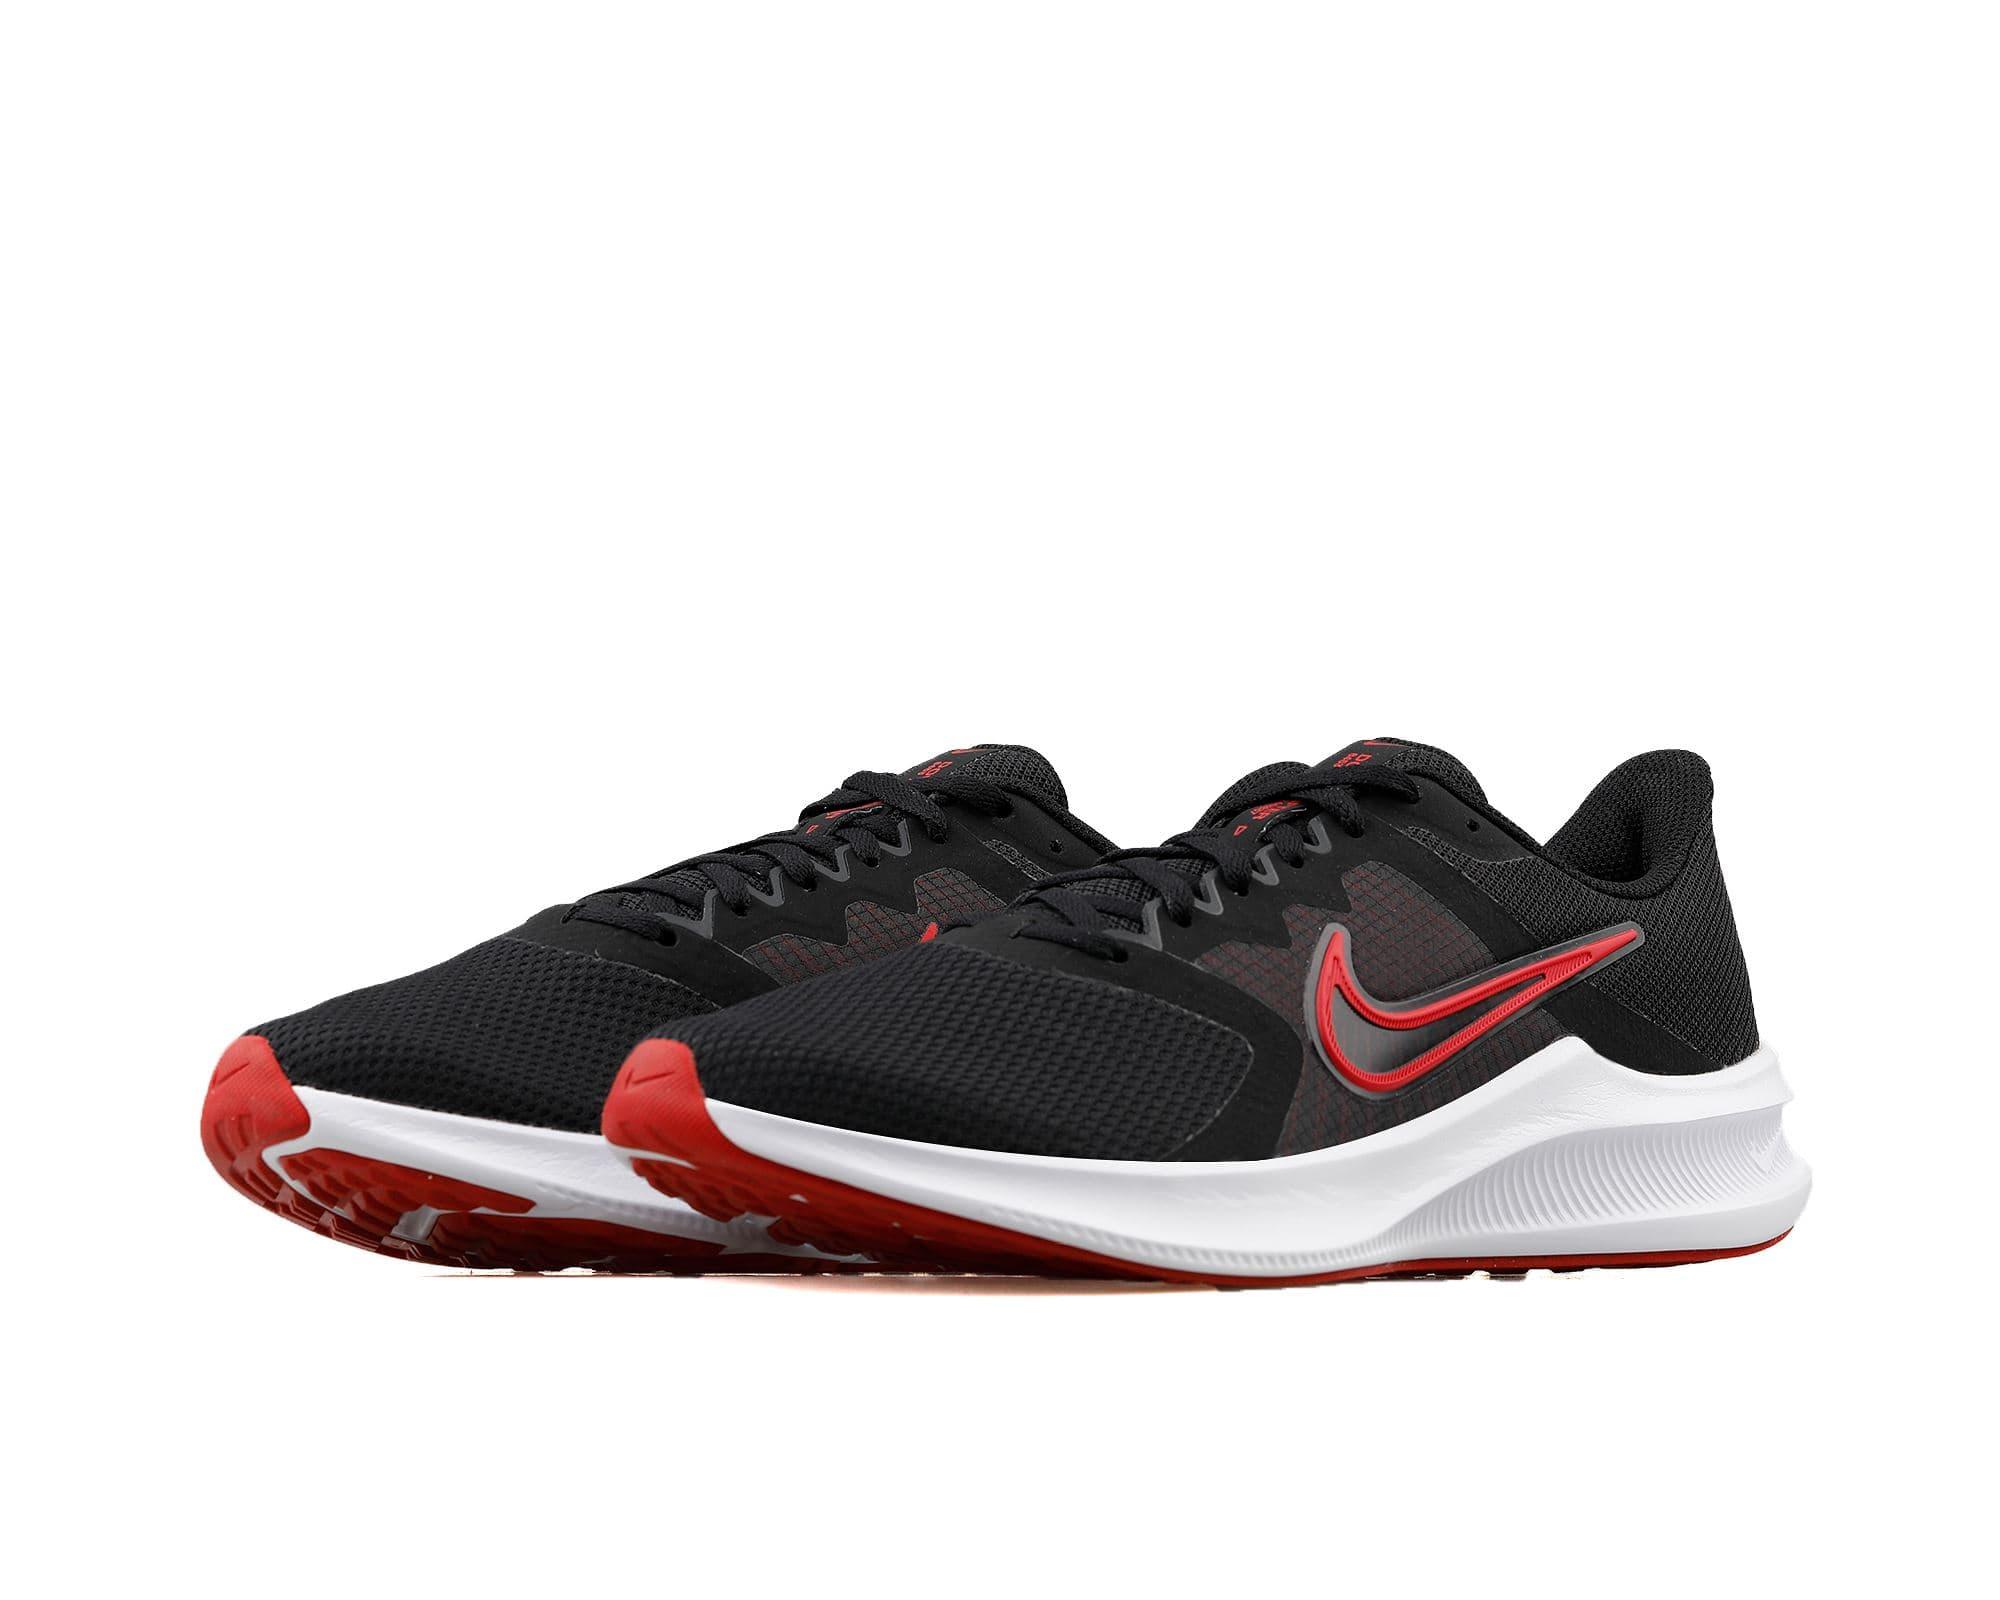 Downshifter 11 Erkek Siyah Koşu Ayakkabısı (CW3411-005)